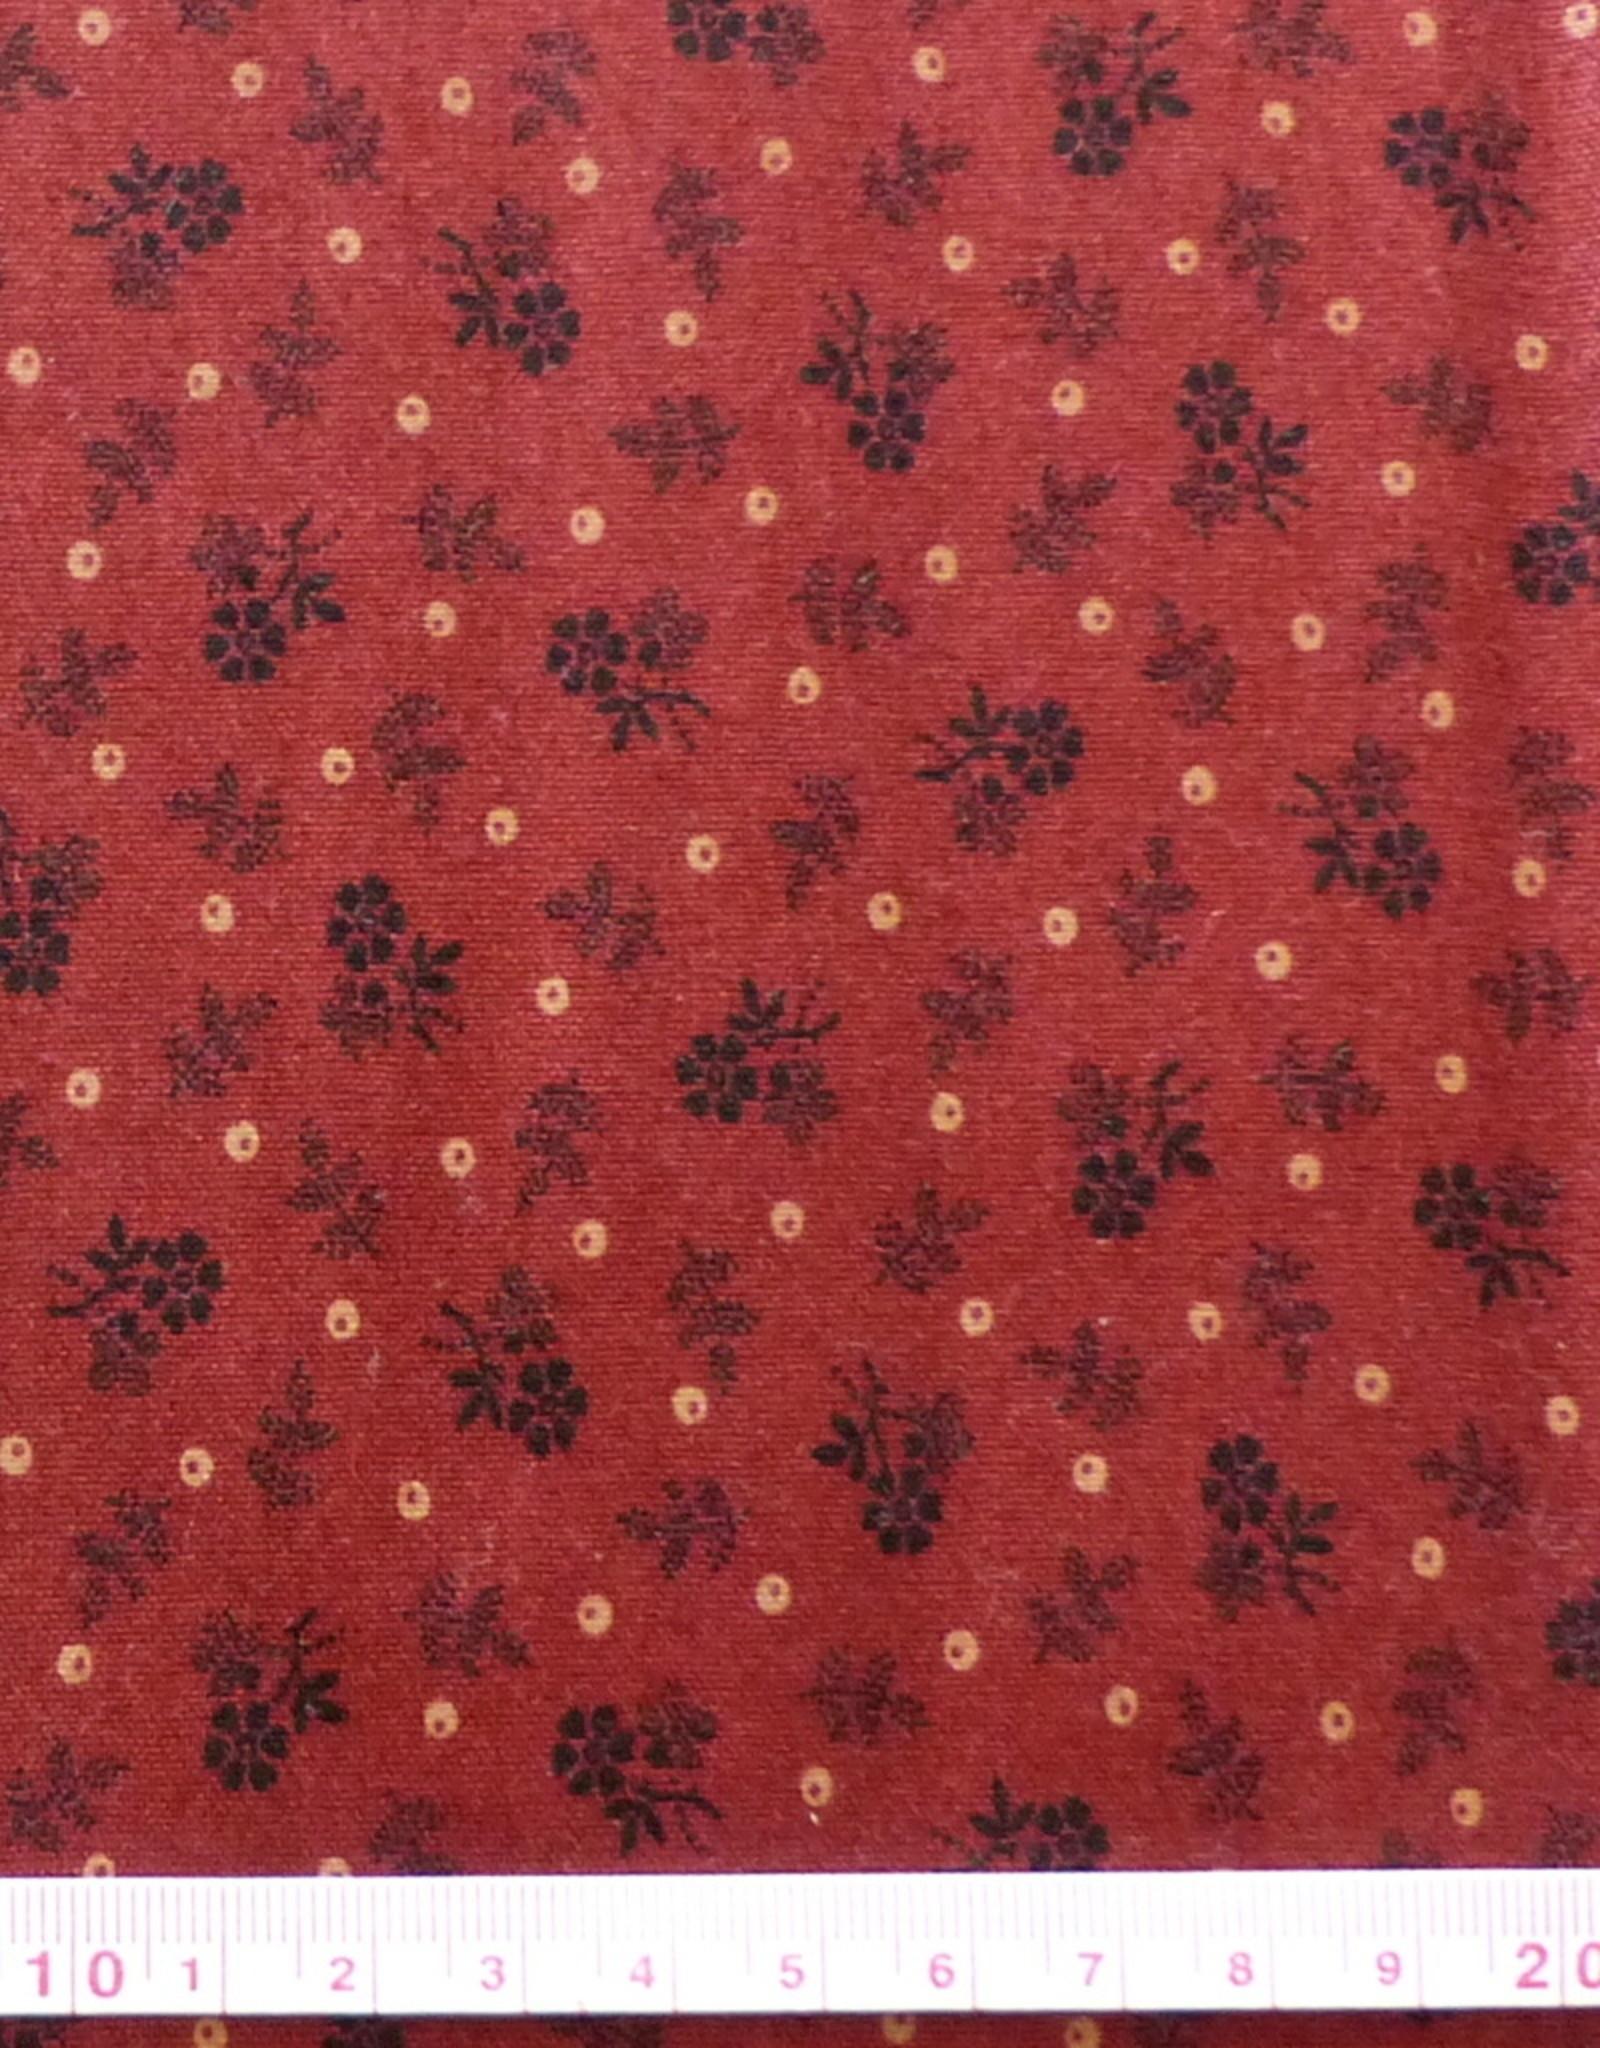 Andover 10 cm Patt 8146 by Kathy Hall